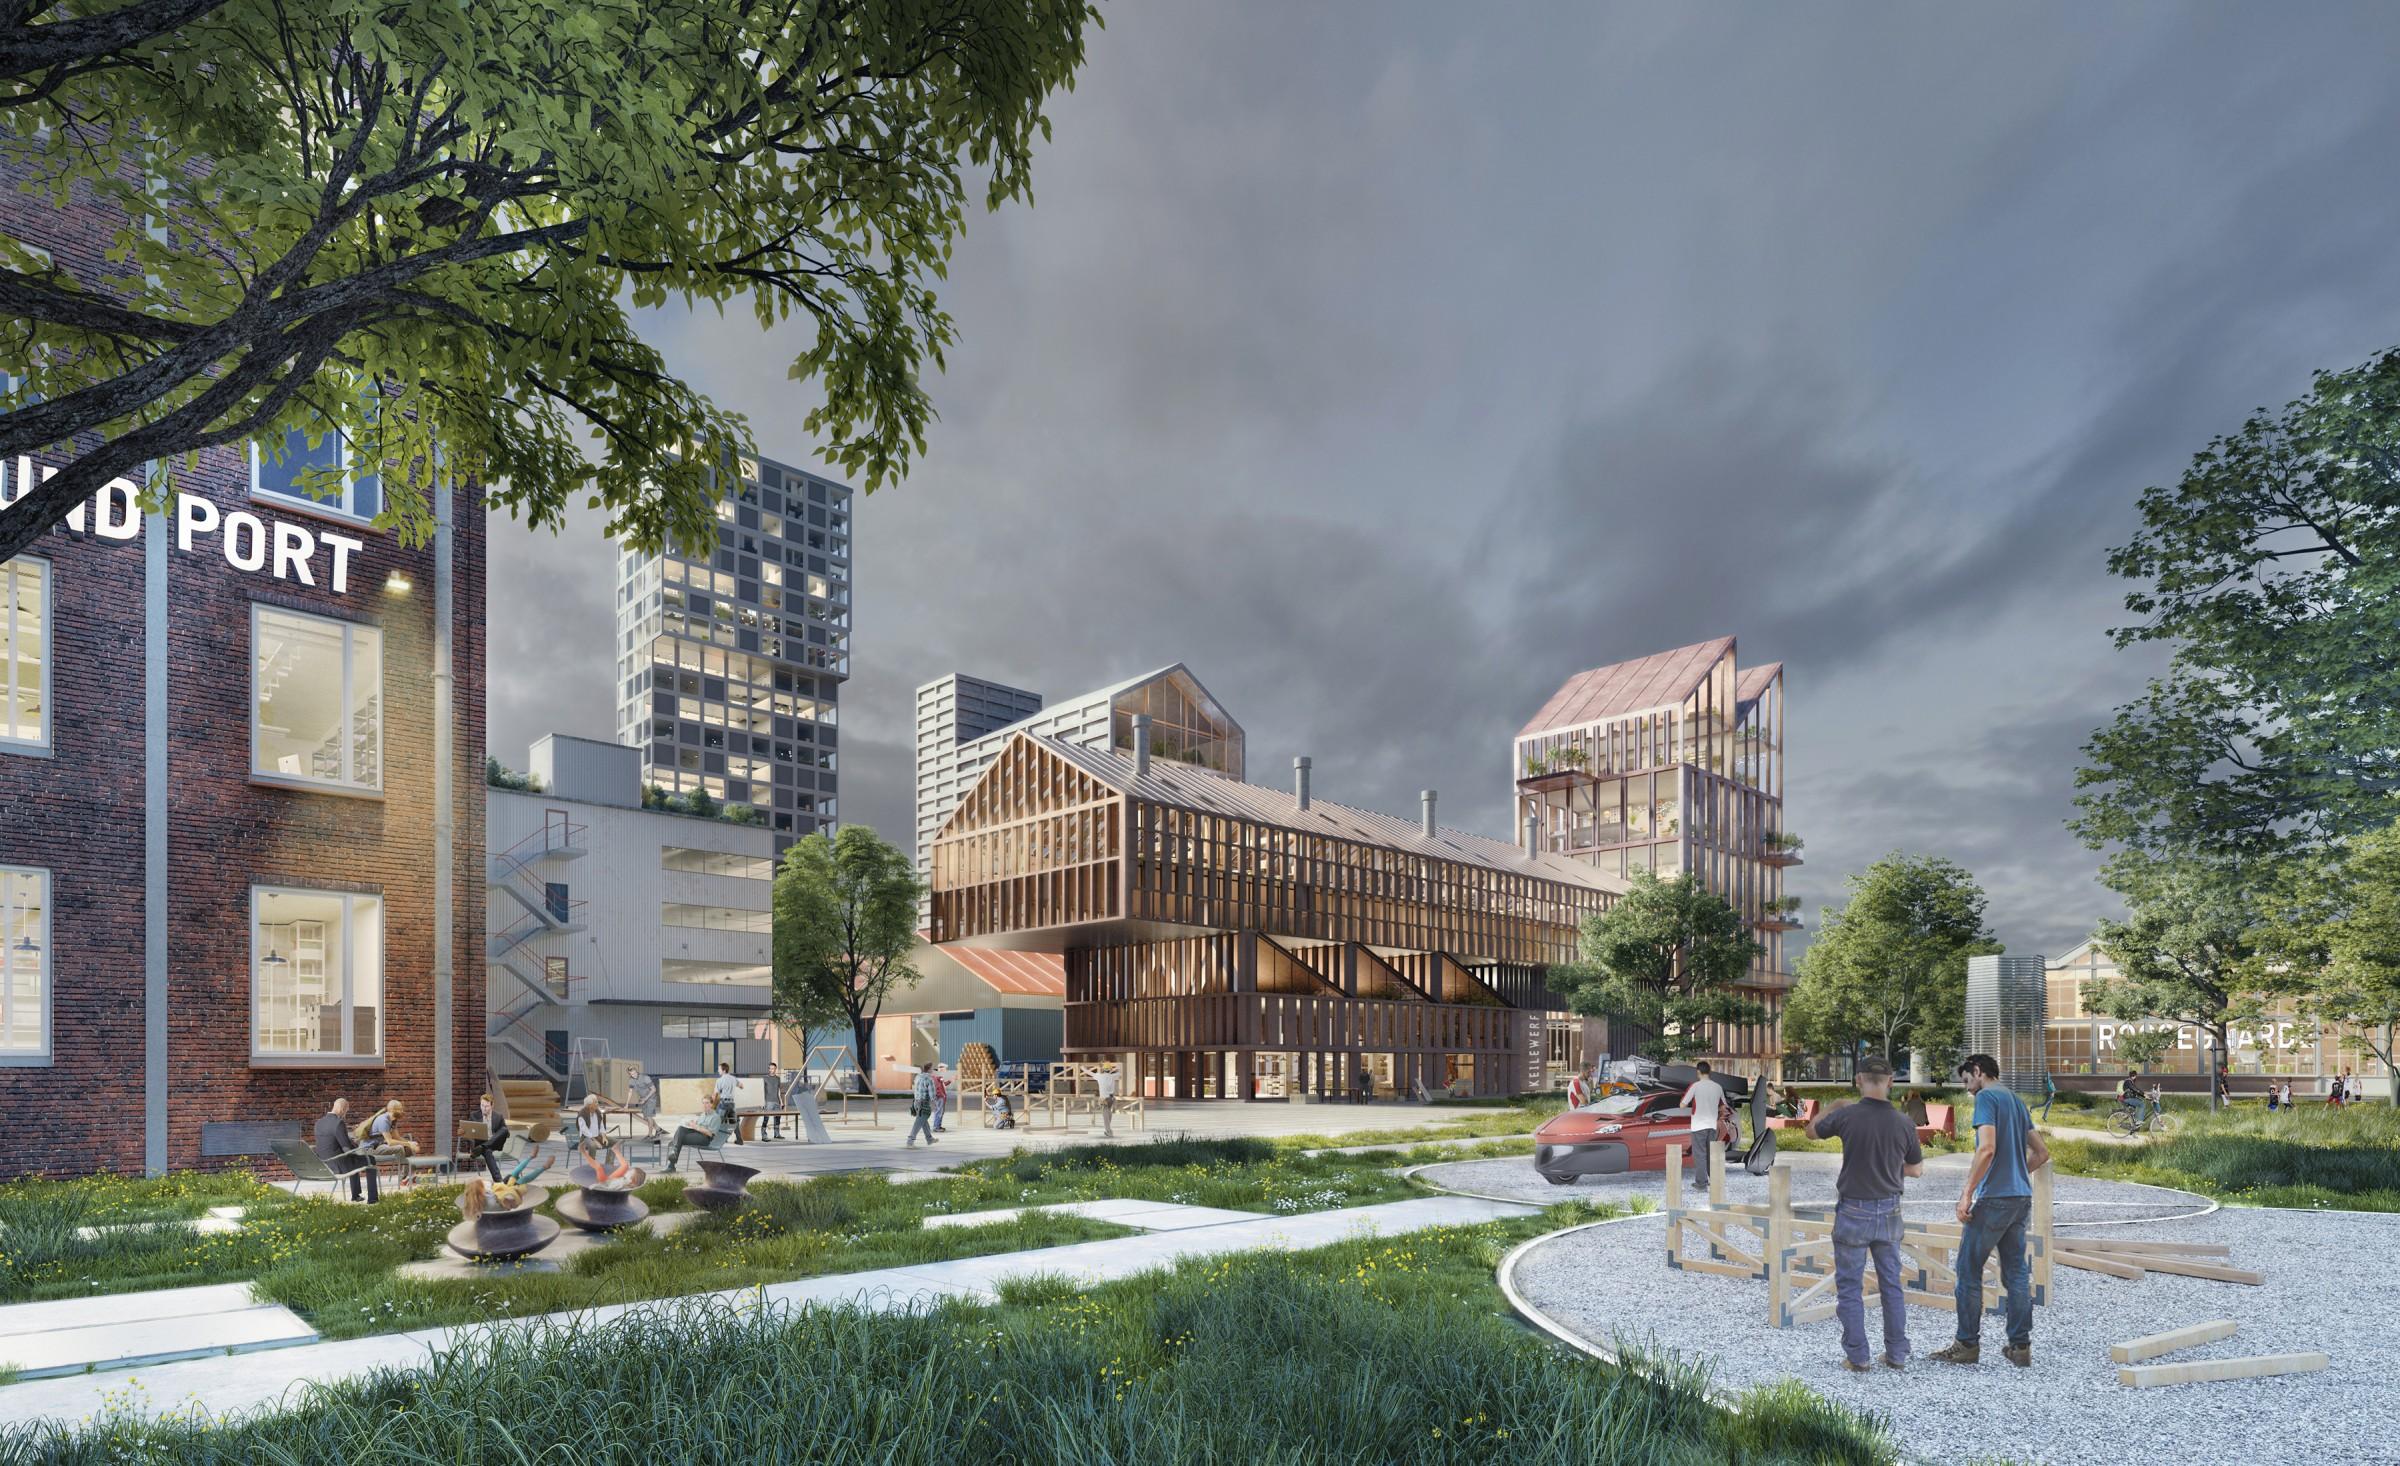 <p>M4H Makershof in M4H &#8211; DELVA Landscape Architects   Urbanism</p>